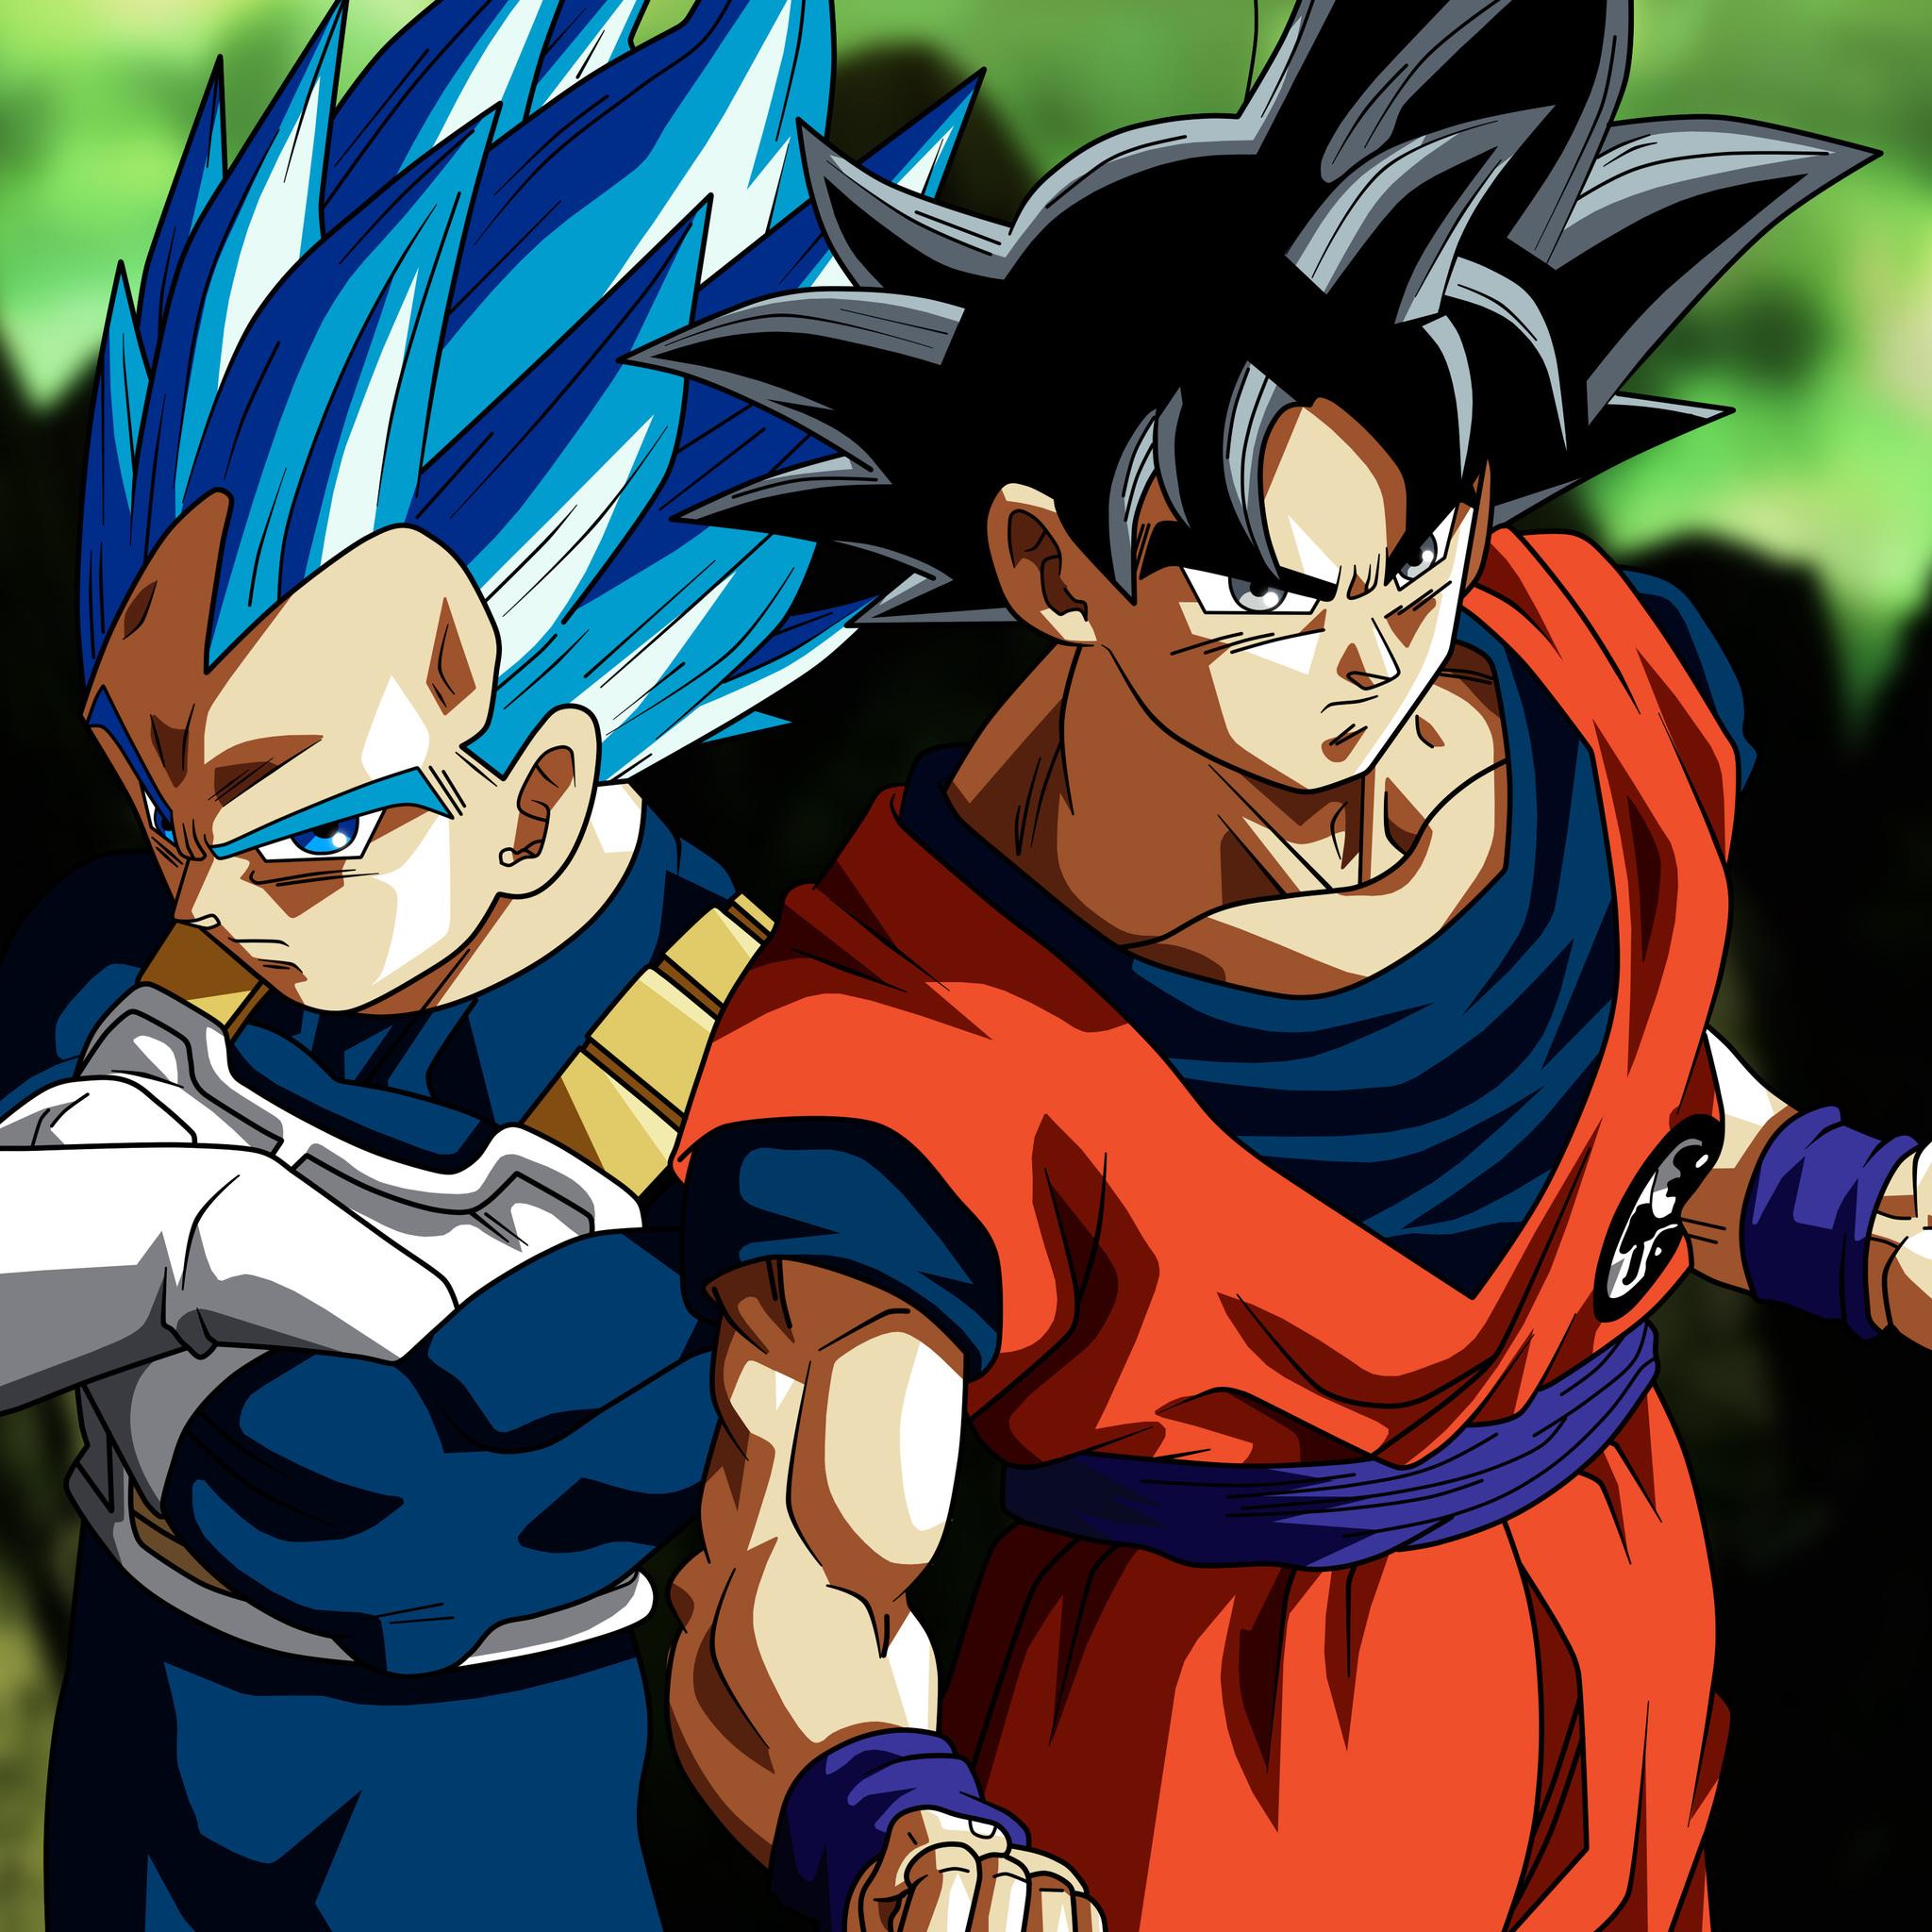 2048x2048 Son Goku Vegeta In Dragon Ball Super 5k Ipad Air